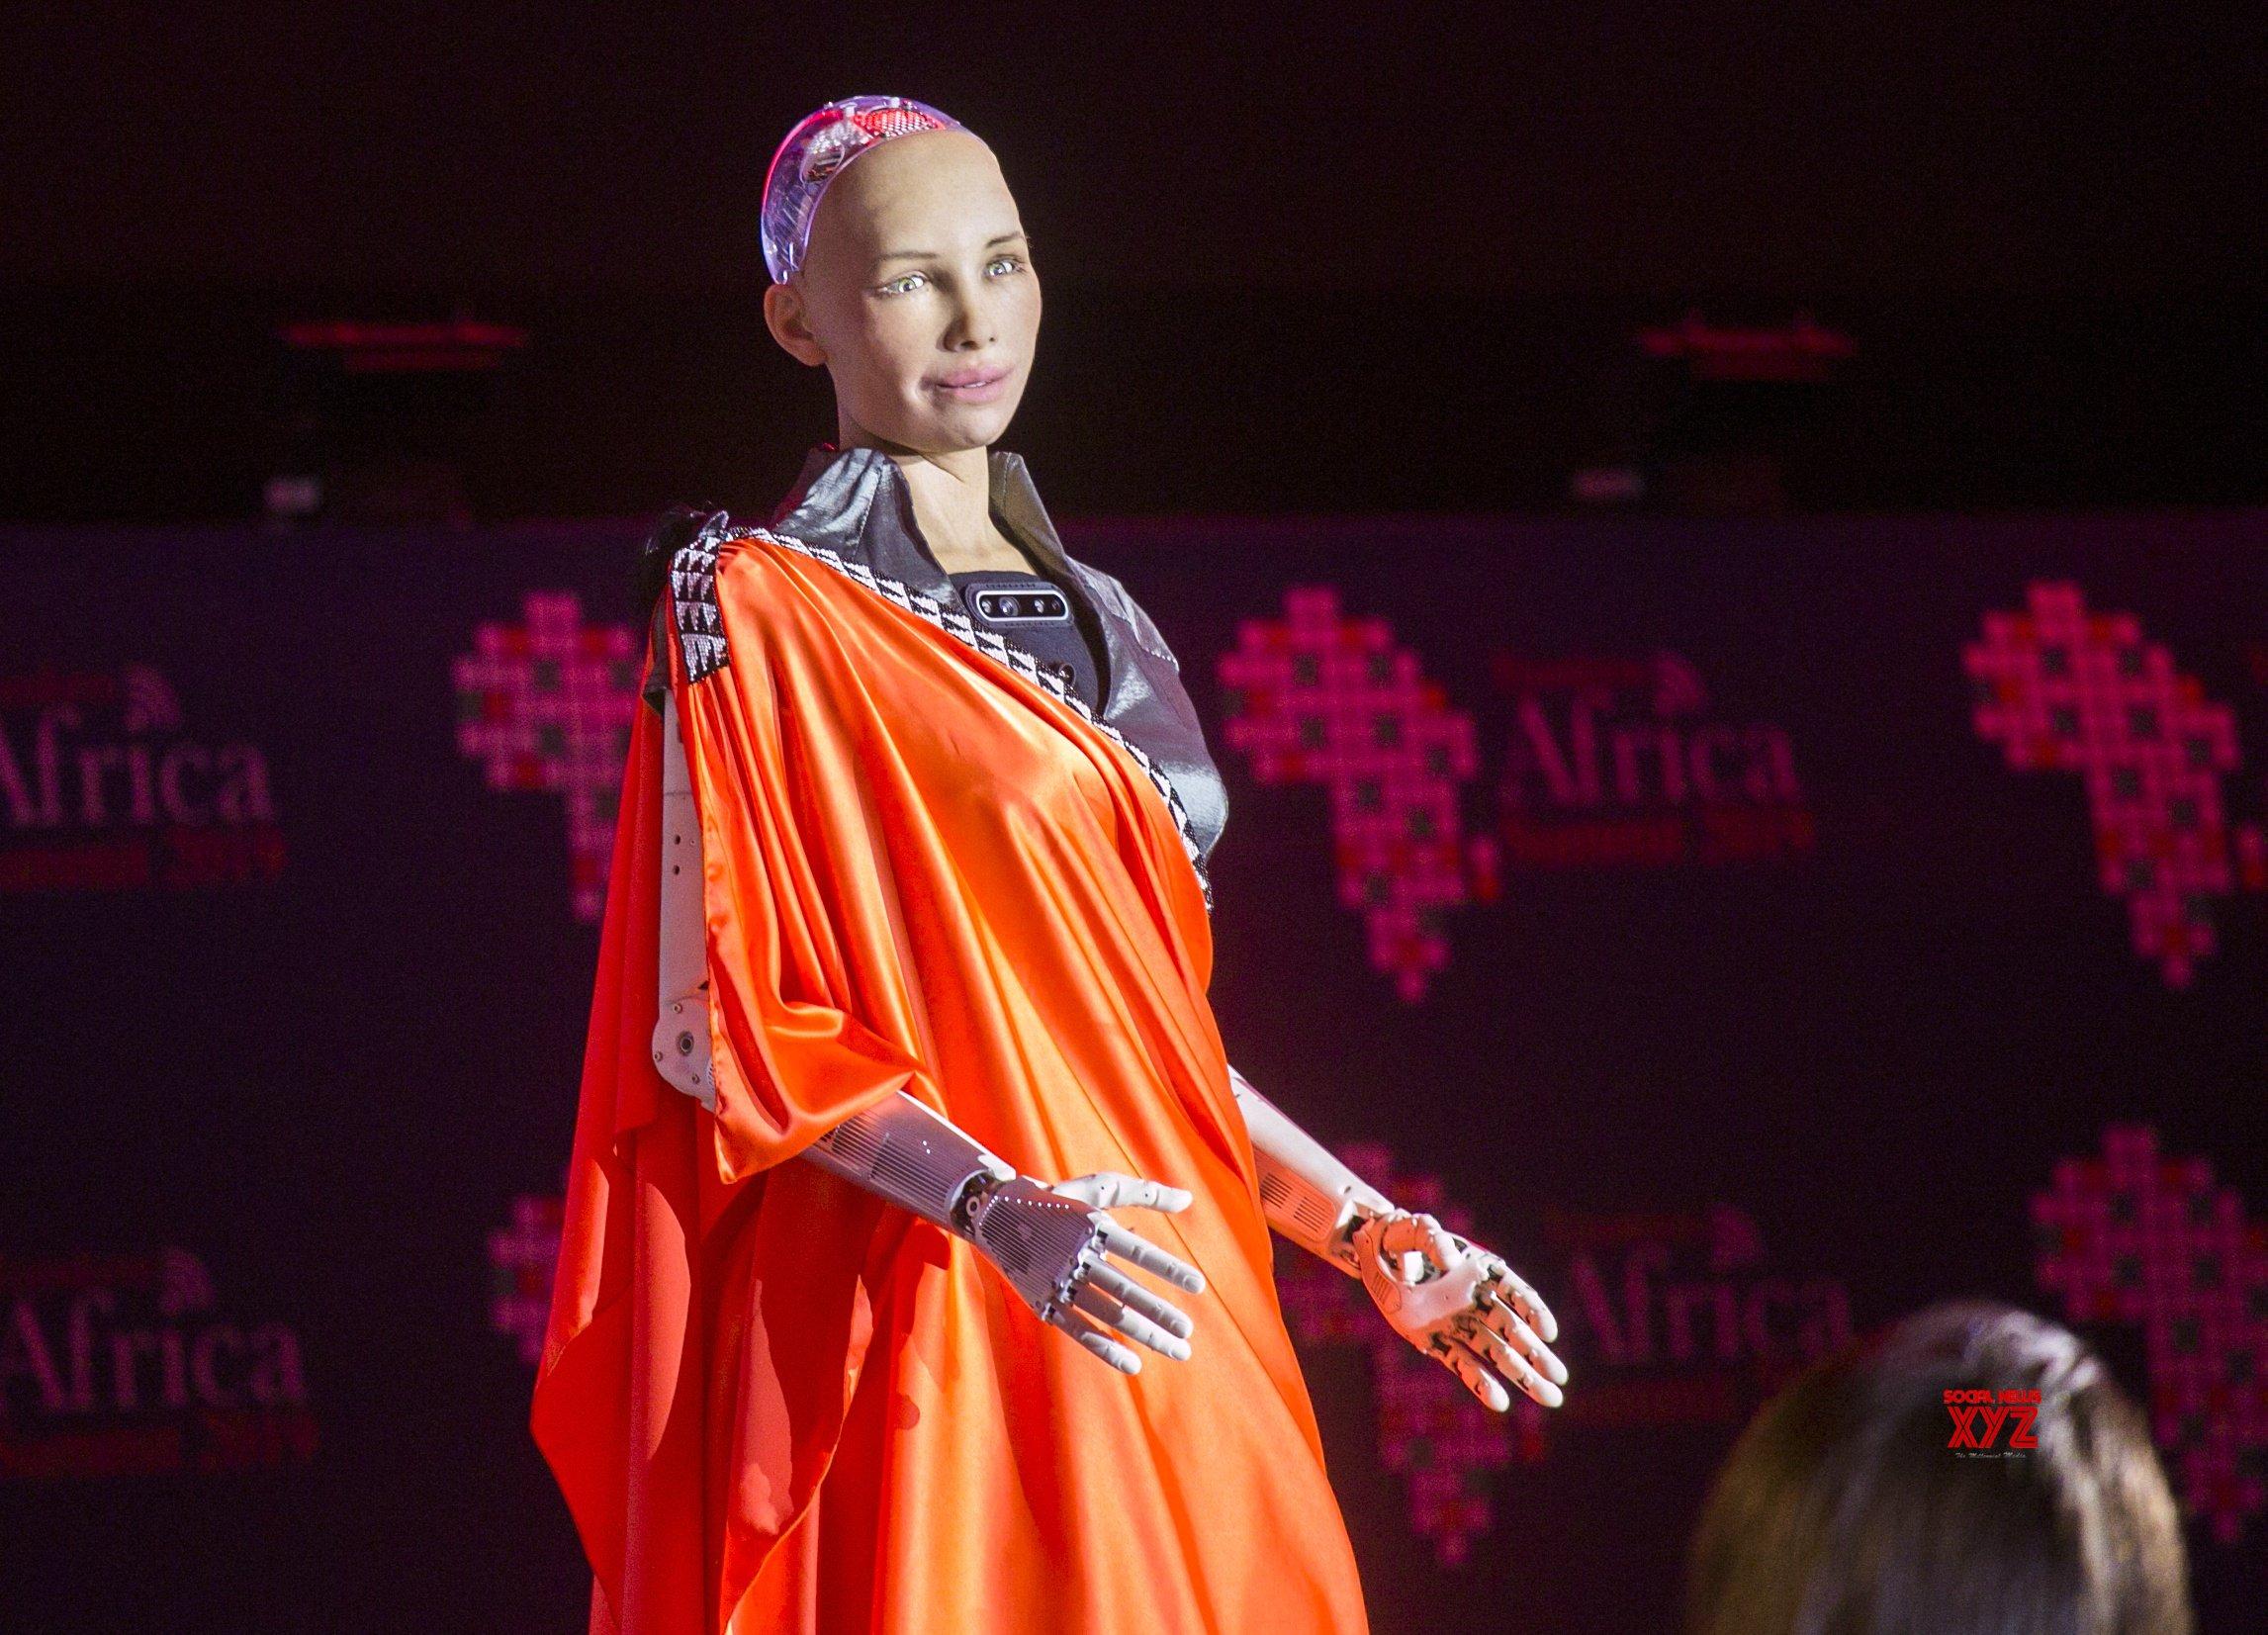 RWANDA - KIGALI - TRANSFORM AFRICA SUMMIT - Humanoid robot Sophia #Gallery